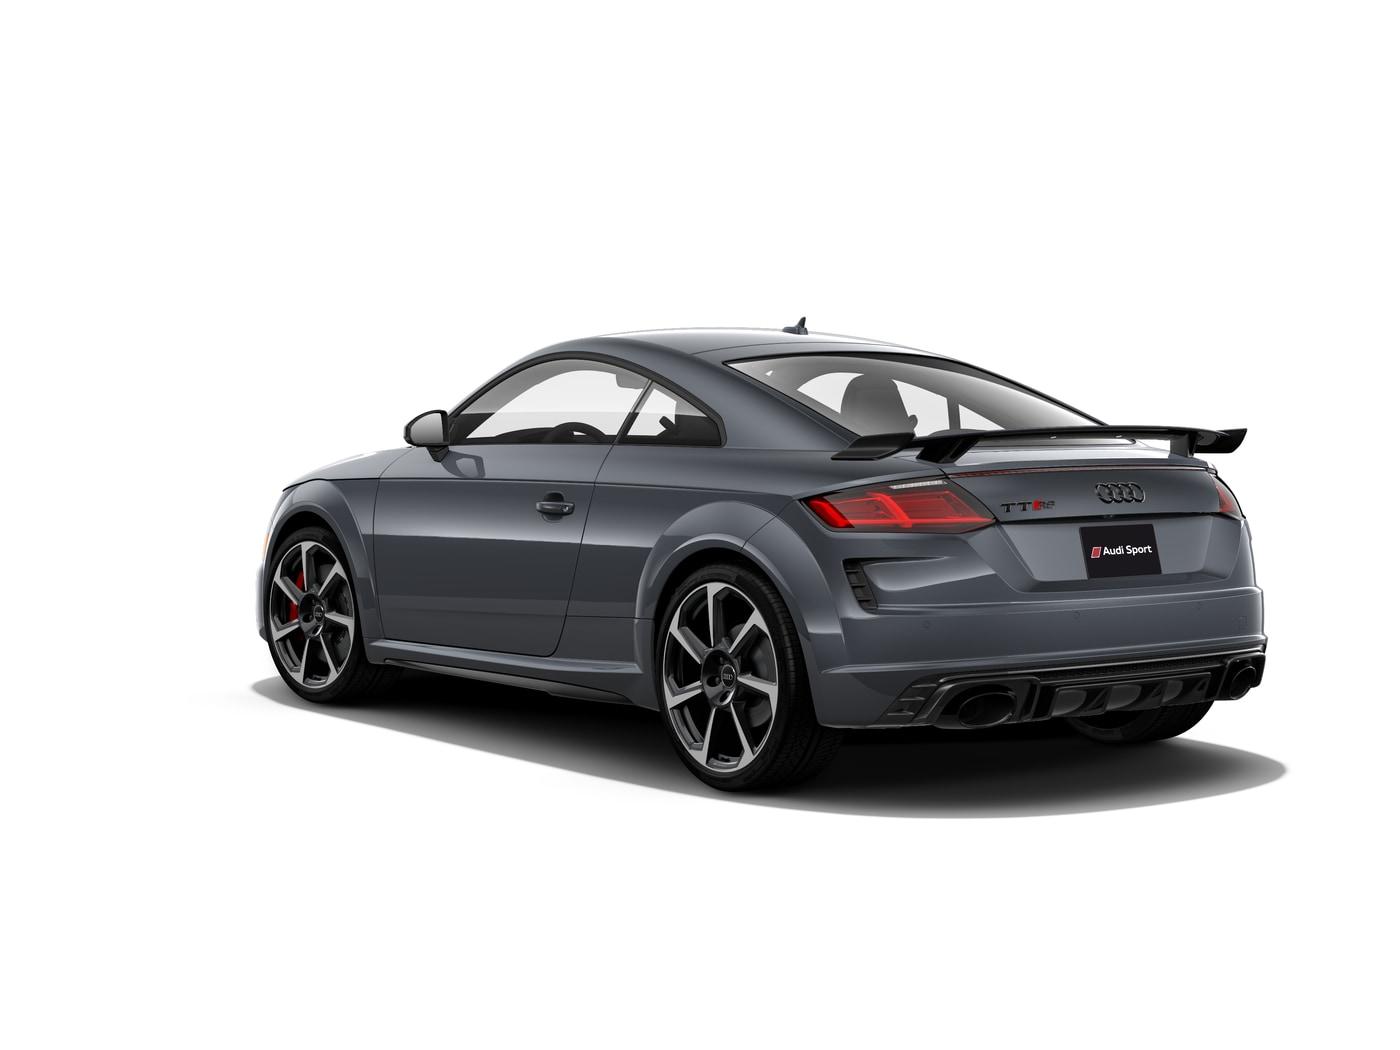 New 2019 Audi Tt Rs 2 5t Coupe Nardo Gray For Sale In Oxnard